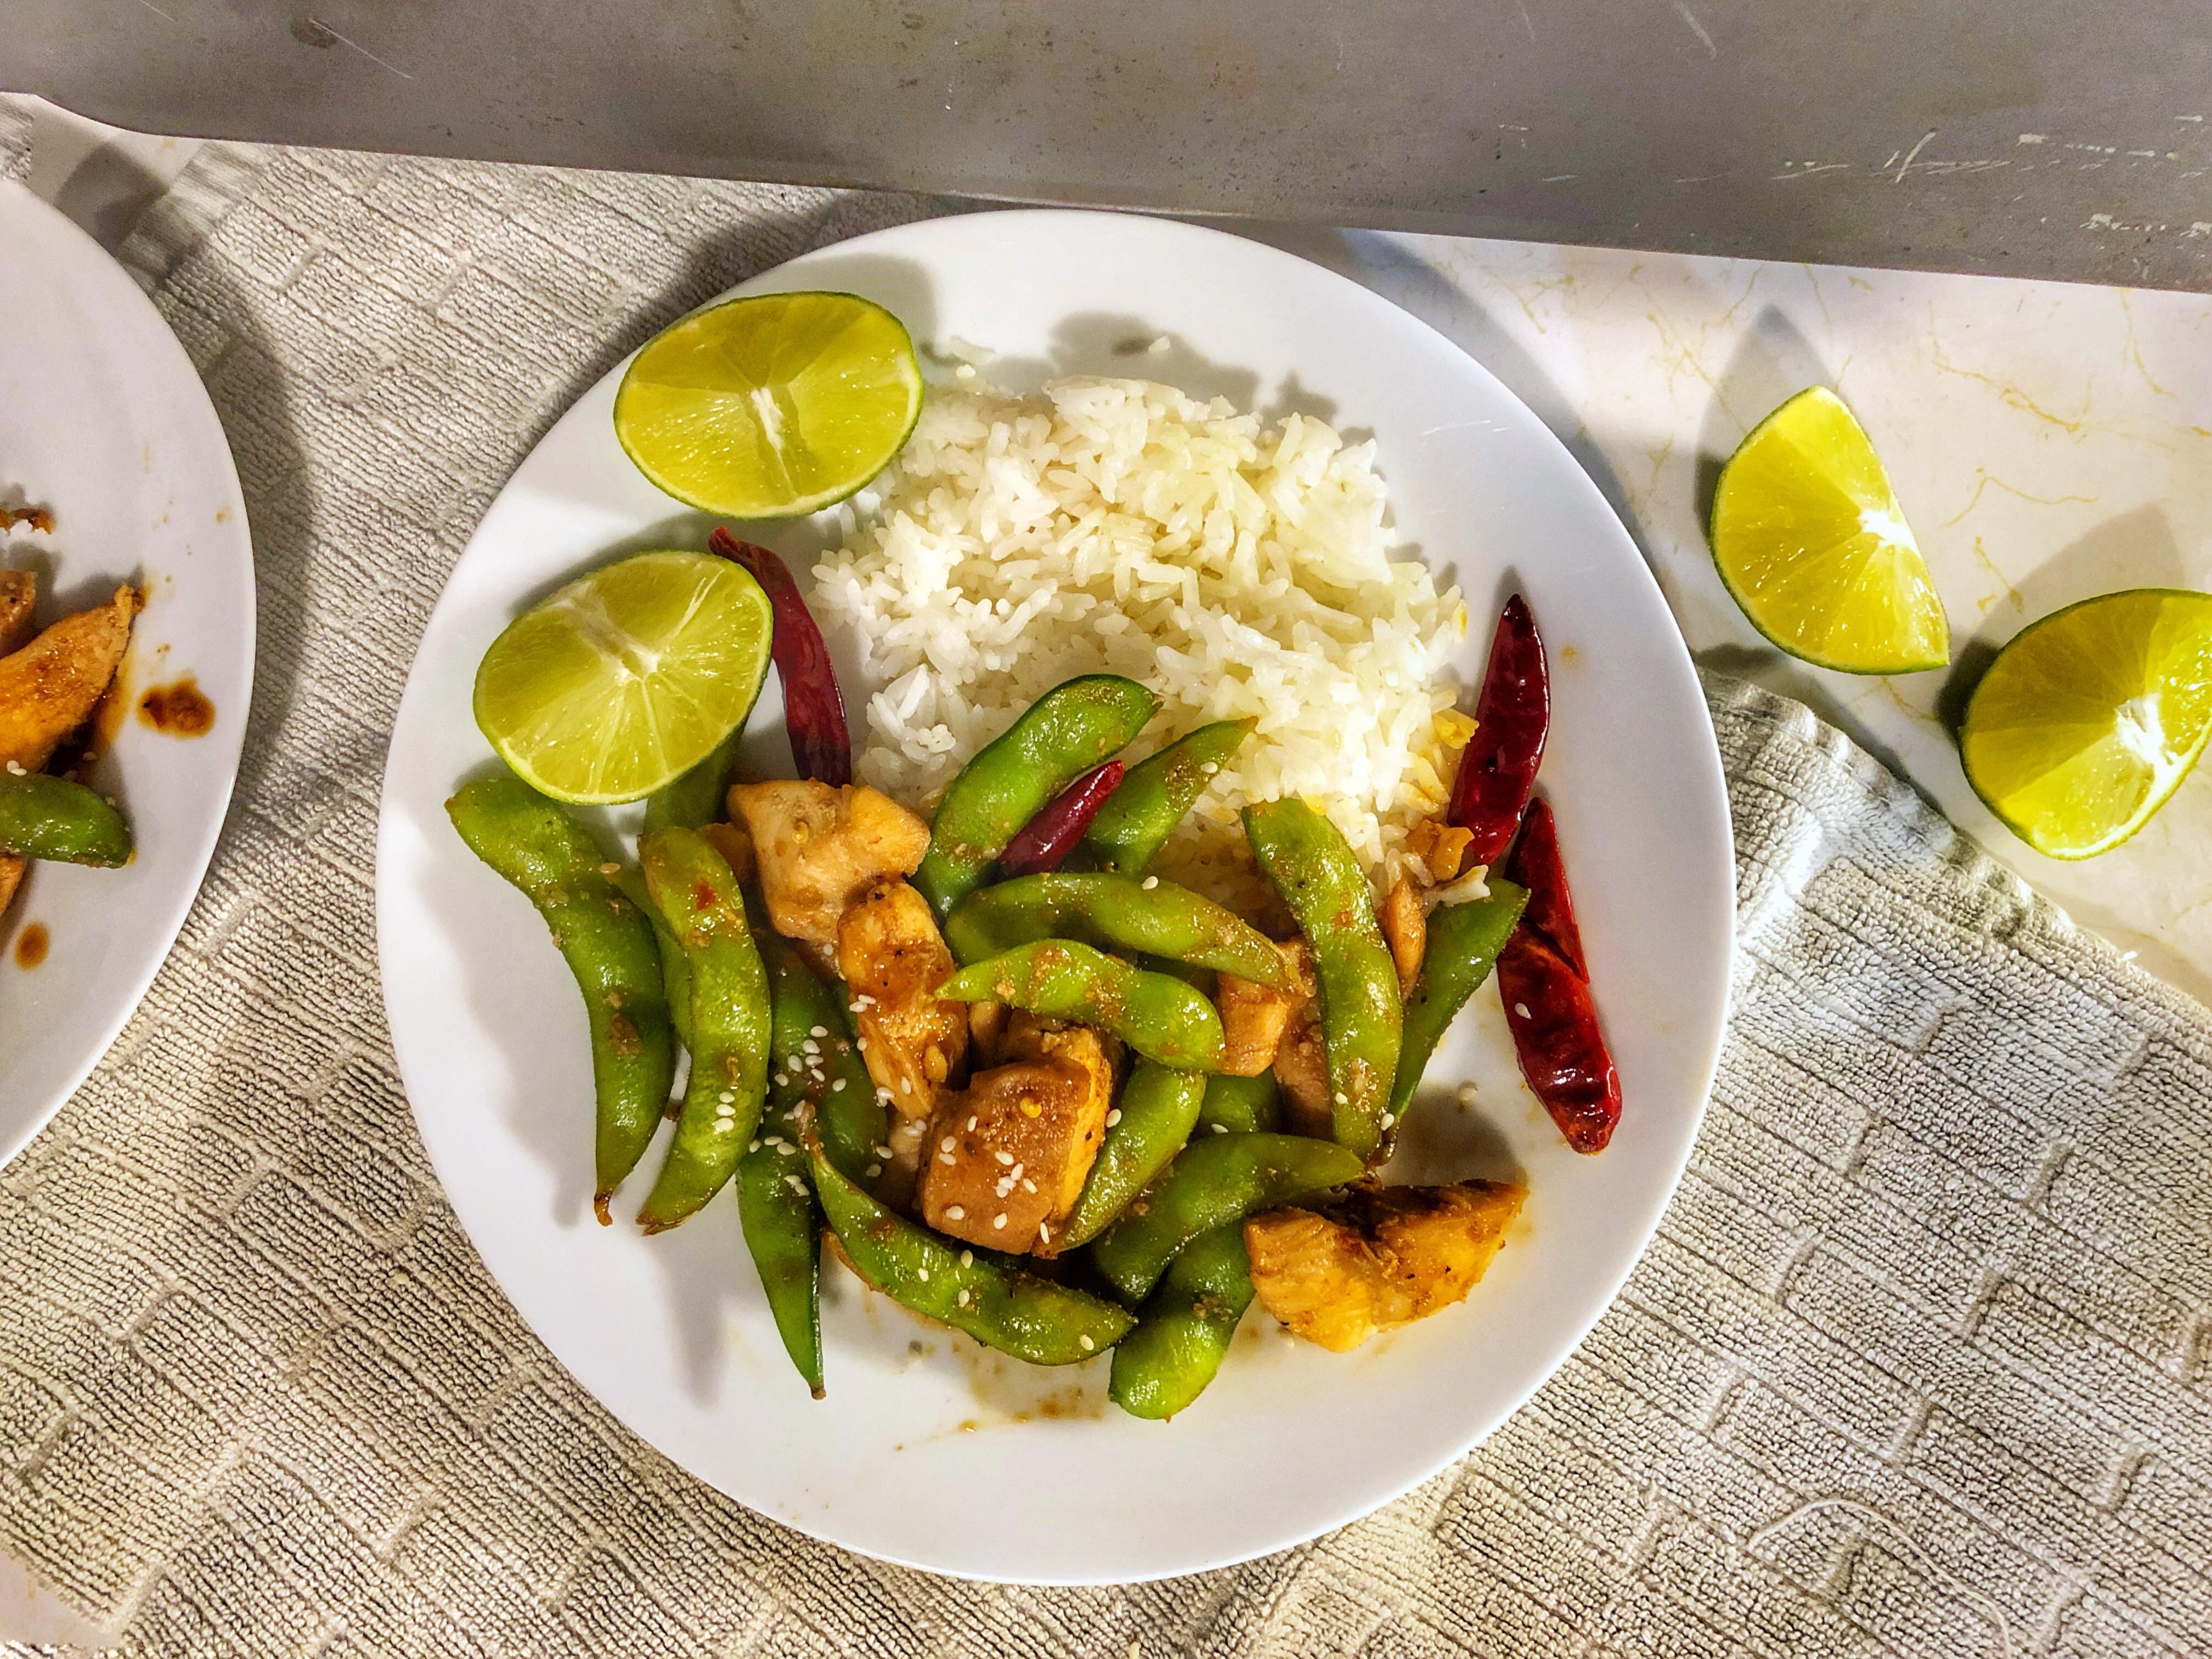 Zesty, Sweet and Spicy Chicken Edamame